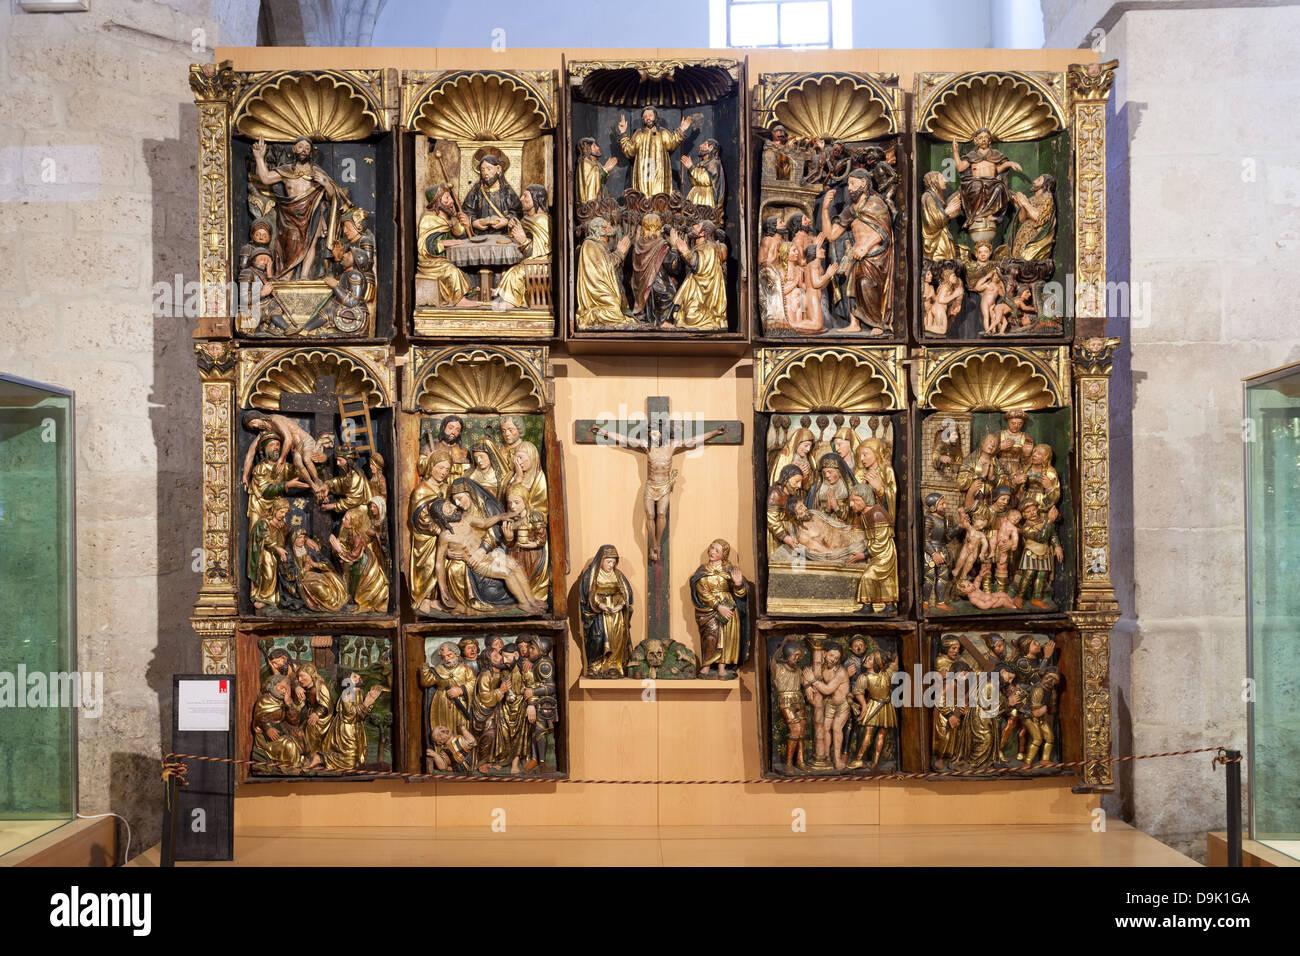 Retablo de las Animas at the Sacred Art Museum - Peñafiel, Spain Stock Photo